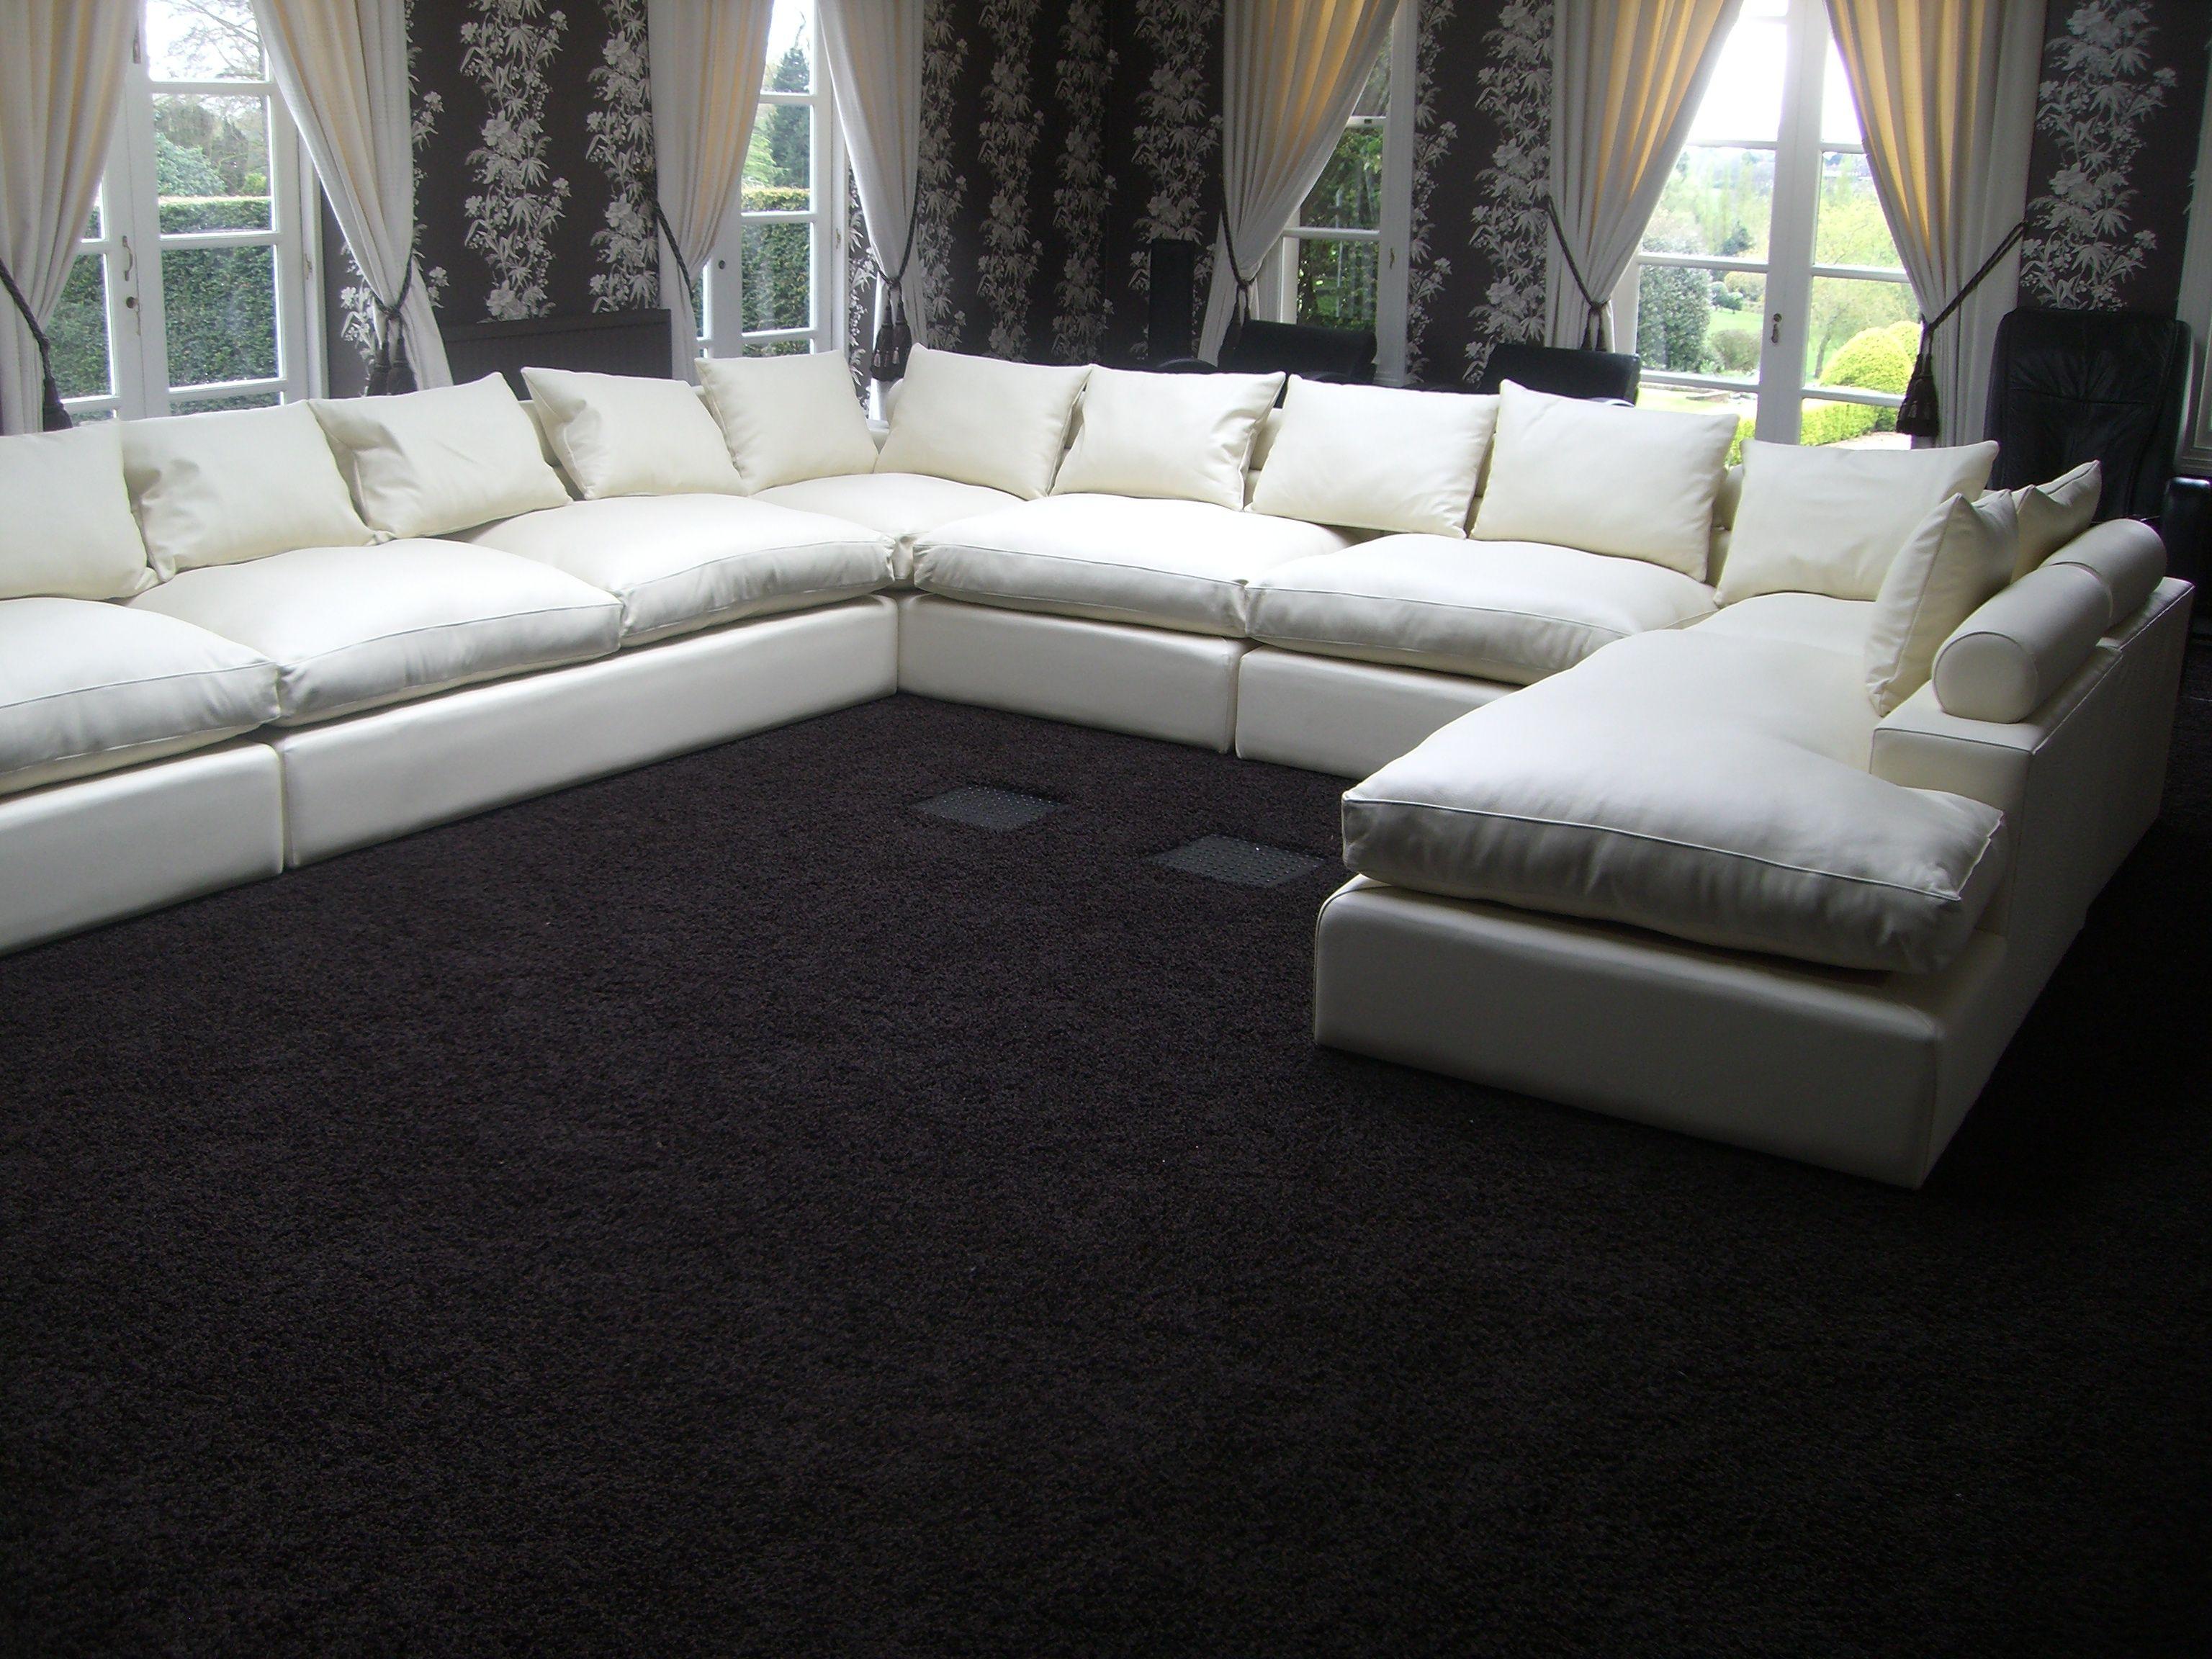 Avignon Modular U Shaped Sofa Home Decor Pinterest Modular Sofa Shape And Sofas